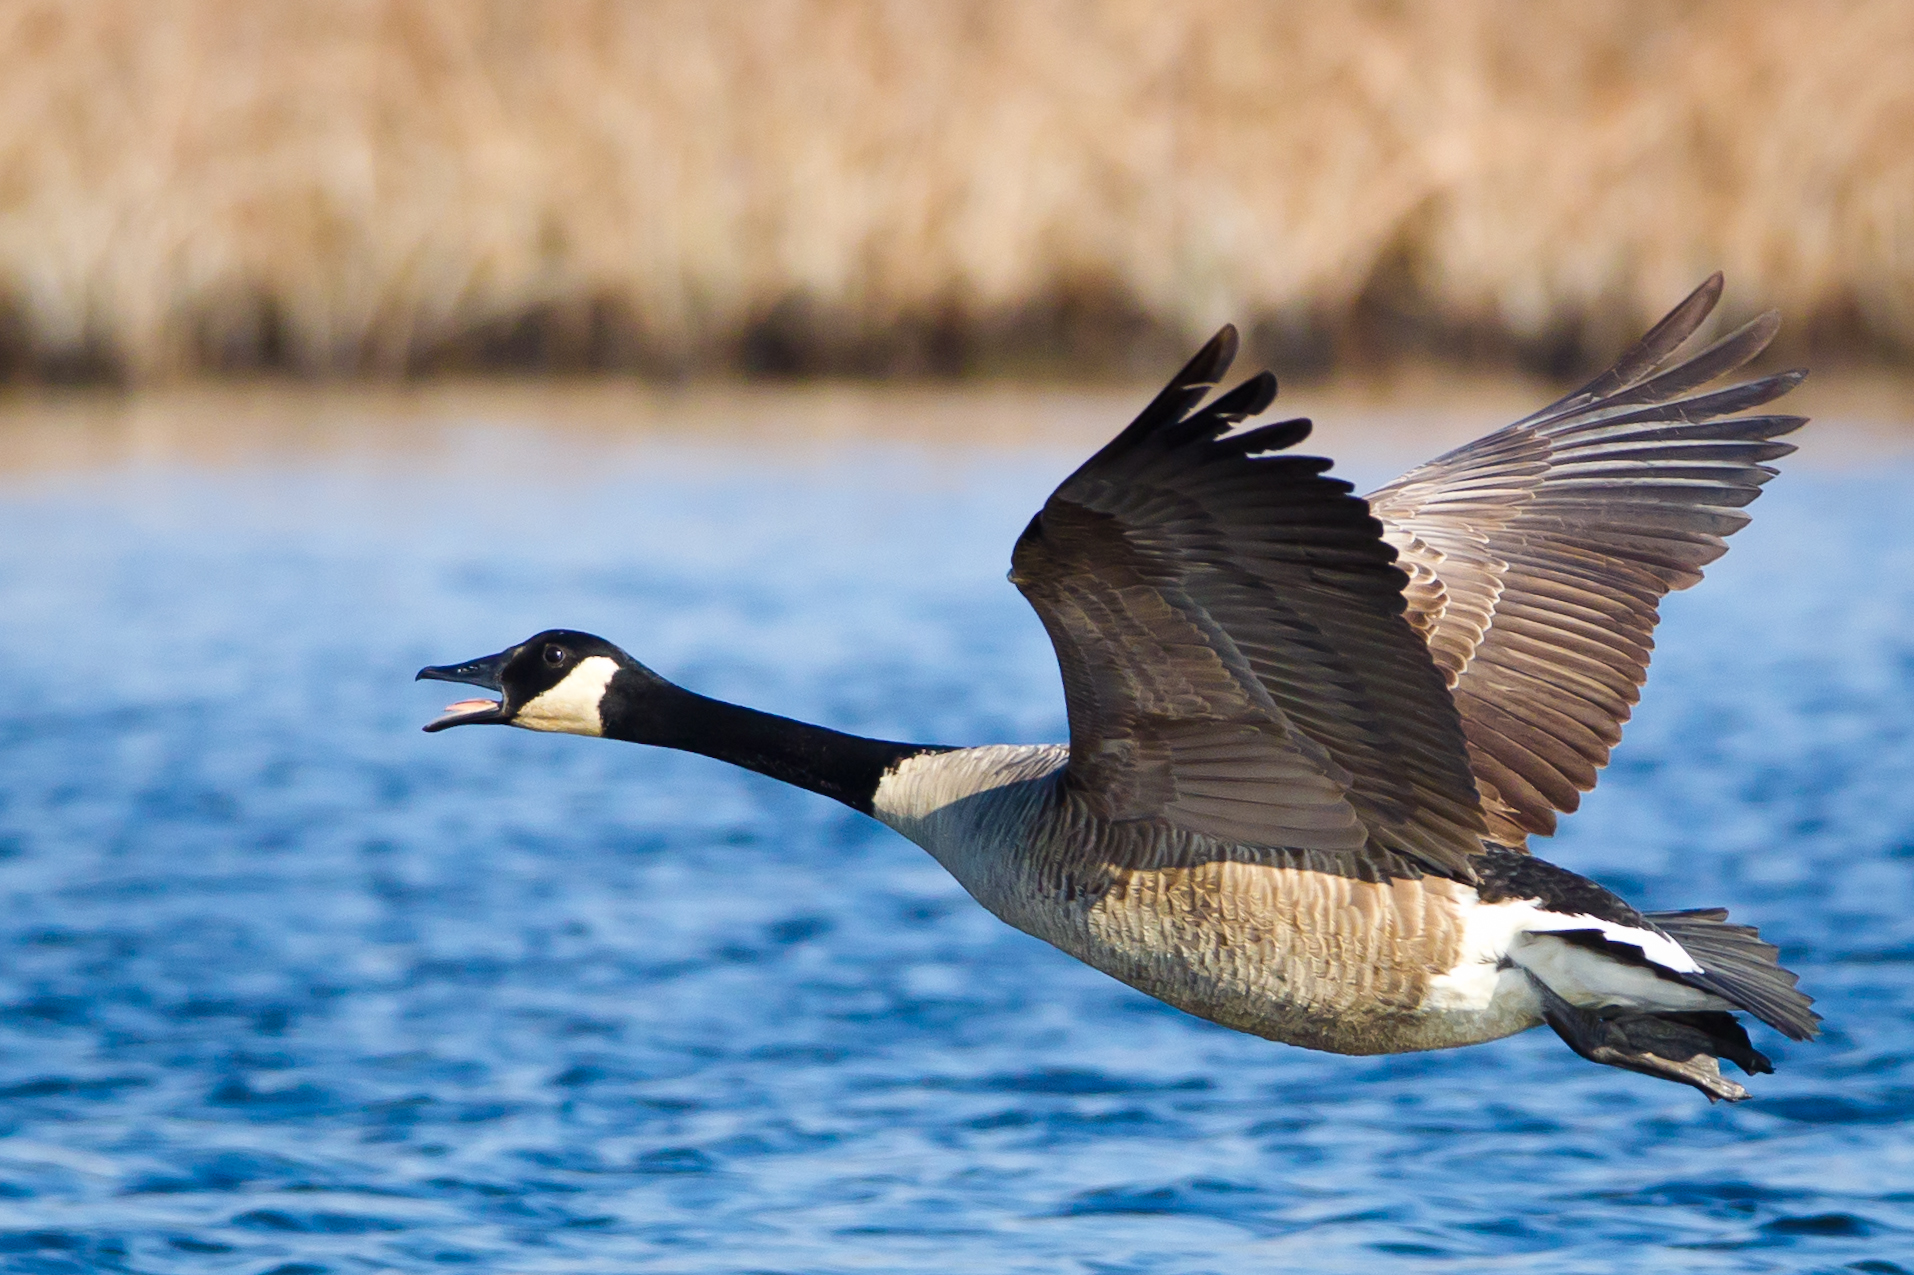 A Canada goose flying near Oceanville, New Jersey. Photo taken on December 8, 2011.